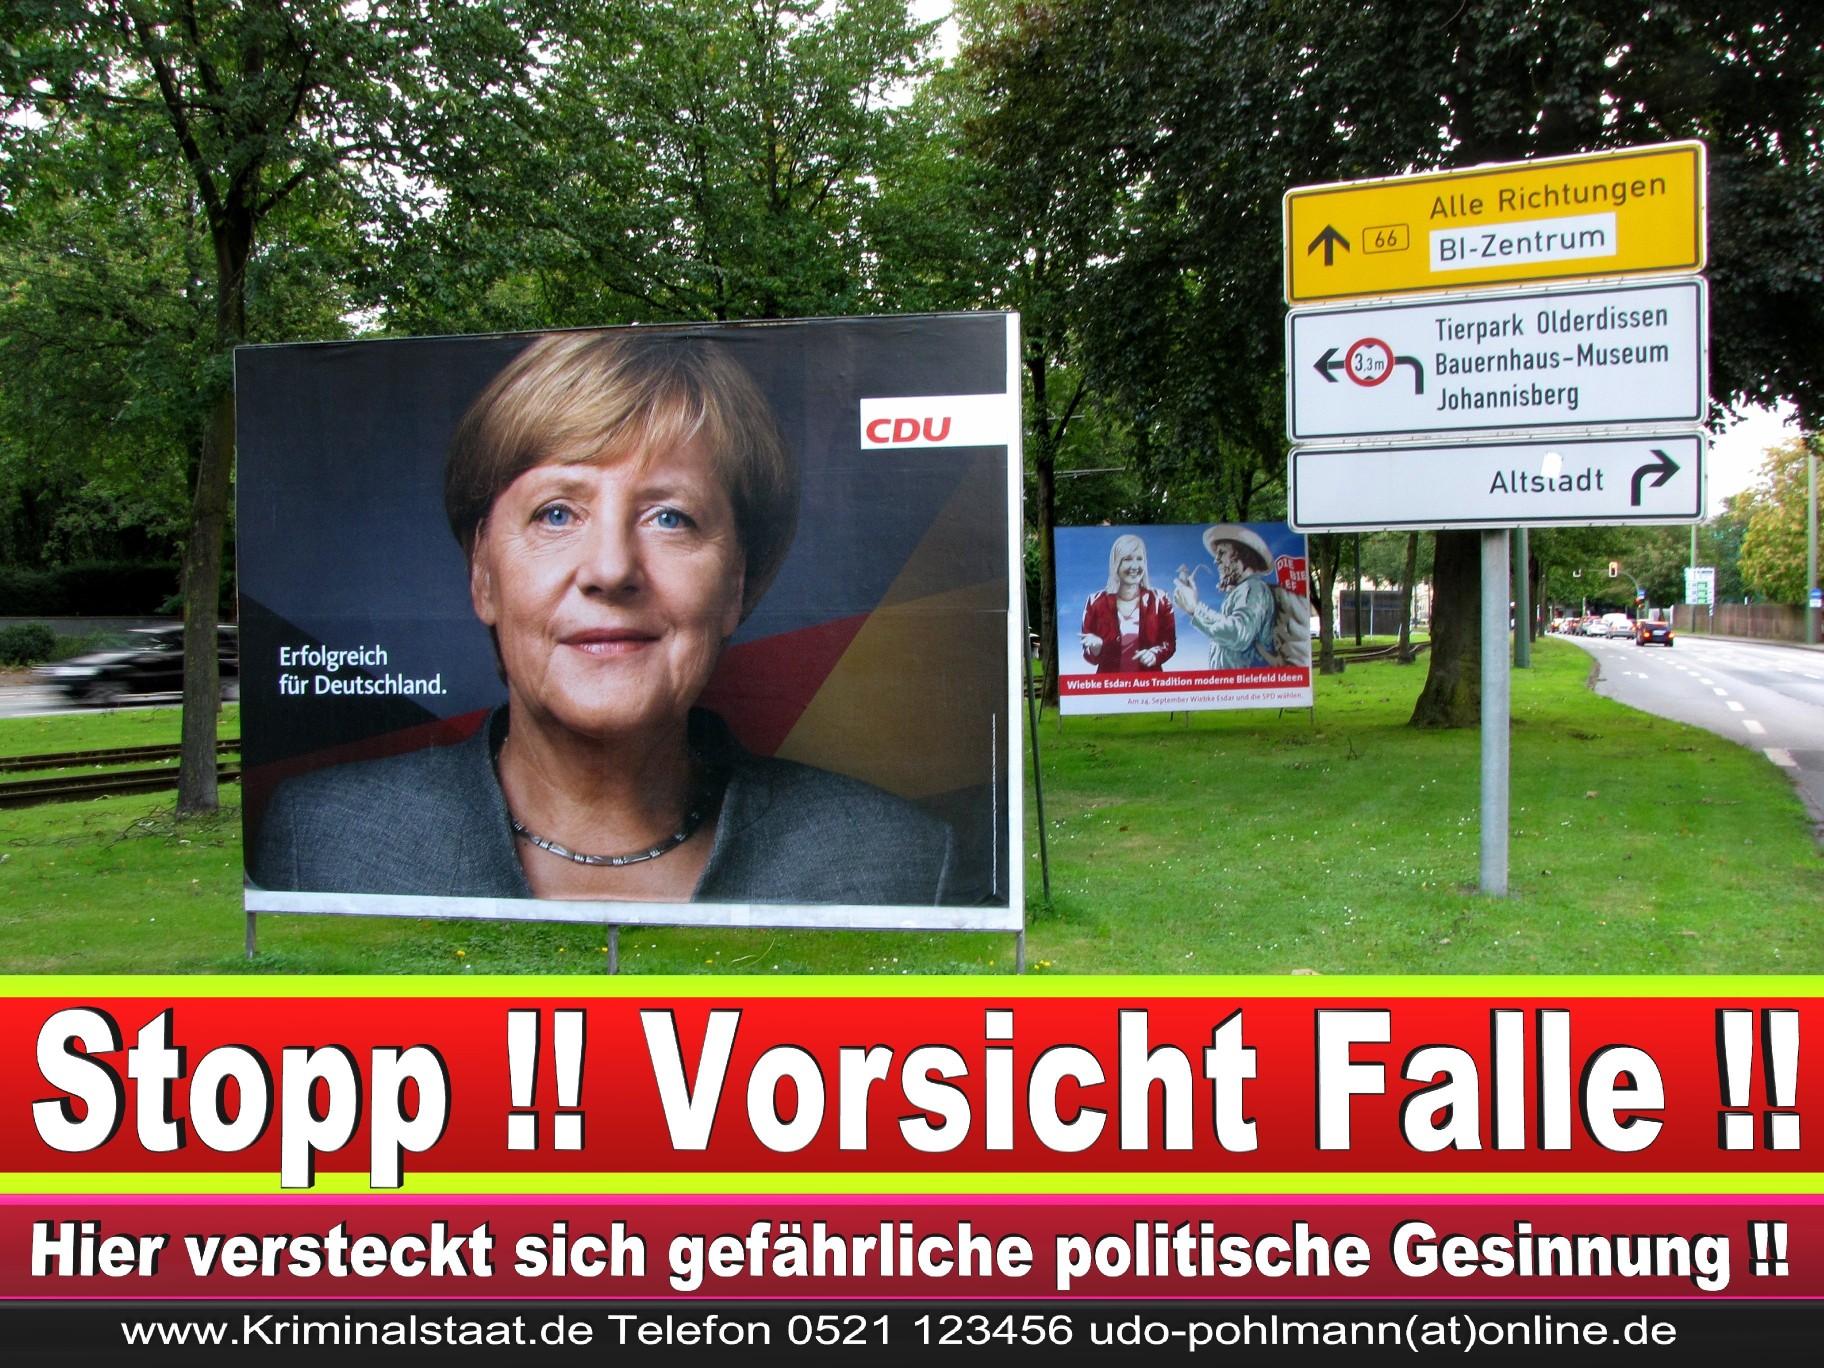 Angela Merkel Wahlplakat Wahlwerbung Bielefeld Volksverhetzung Durch Religion 4